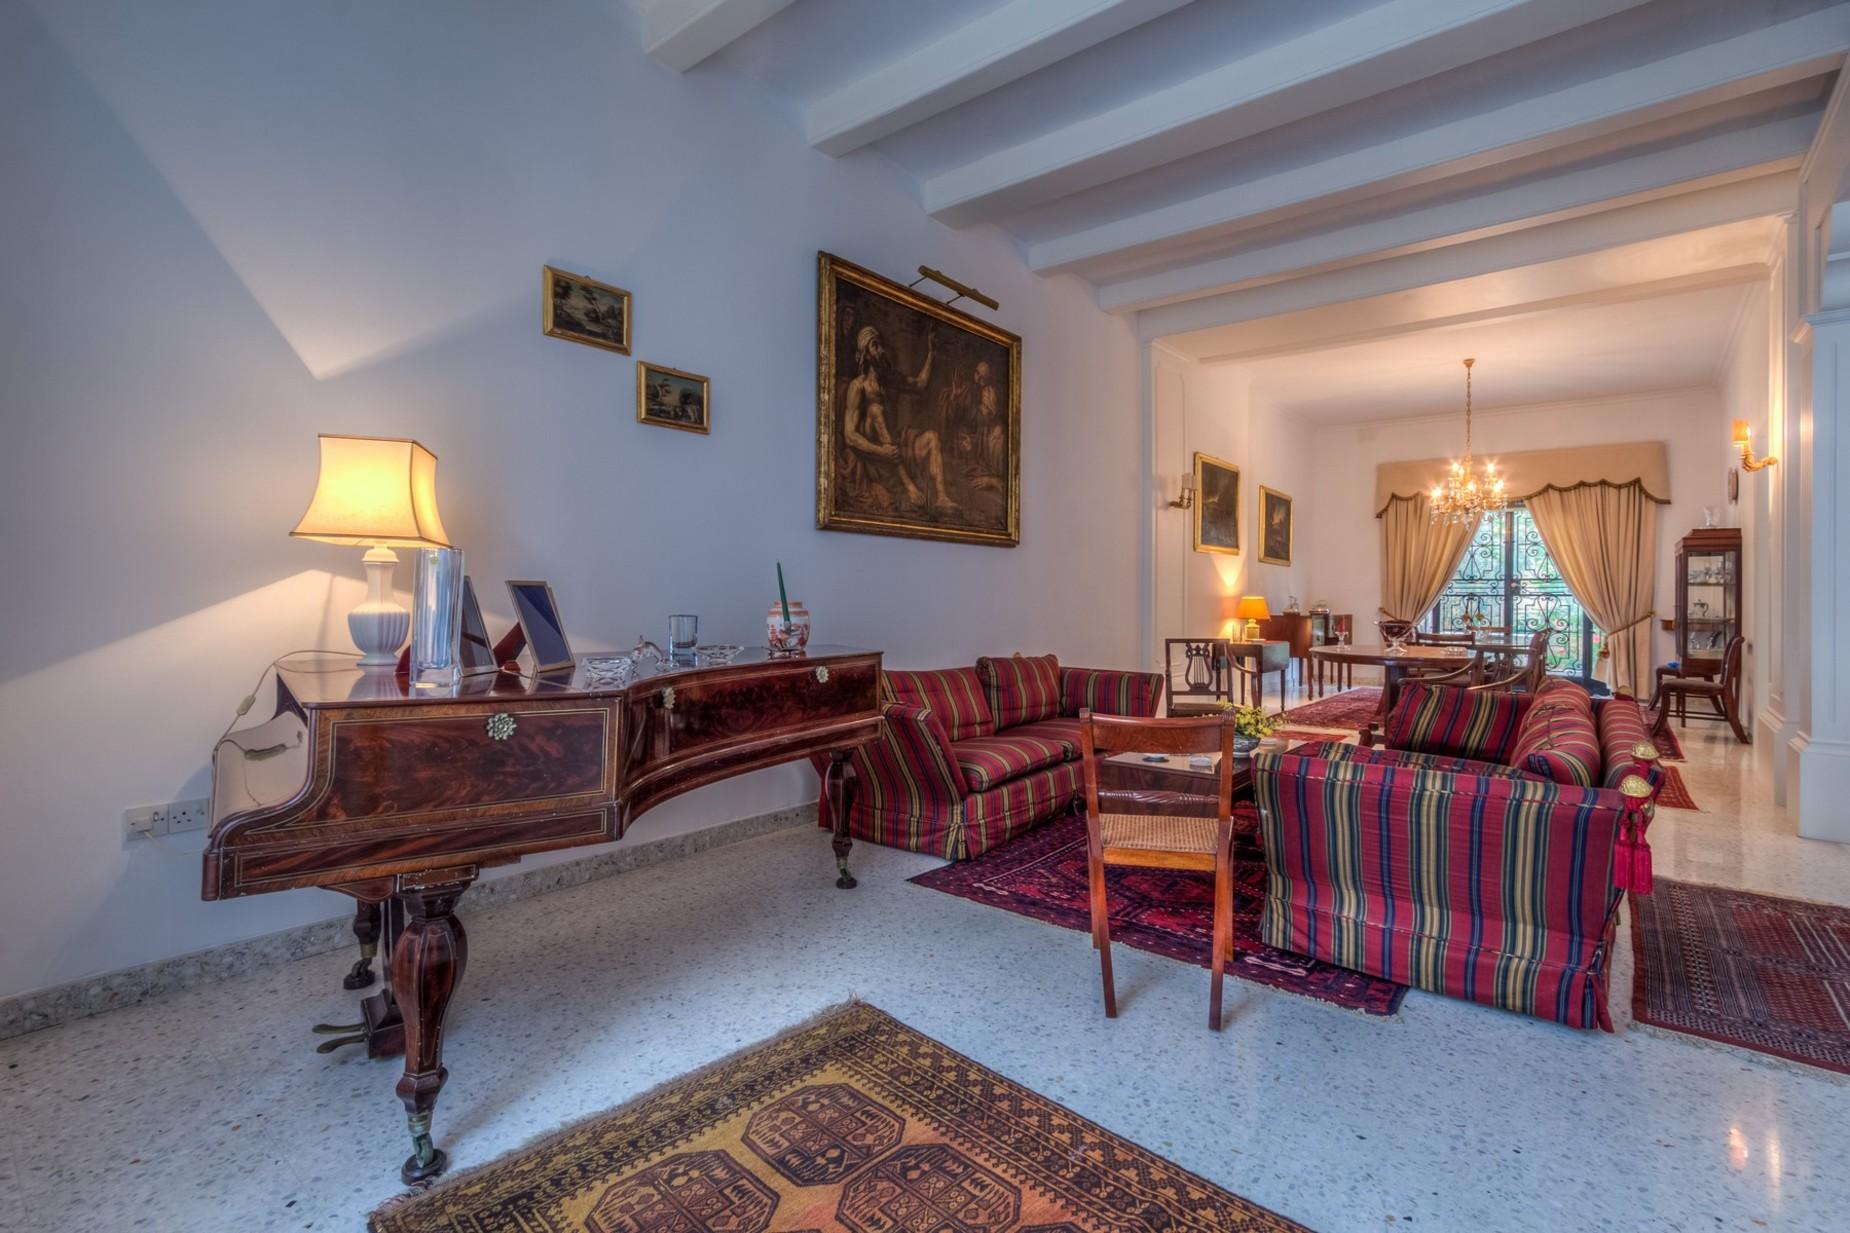 5 bed Villa For Rent in St Julian's, St Julian's - thumb 4